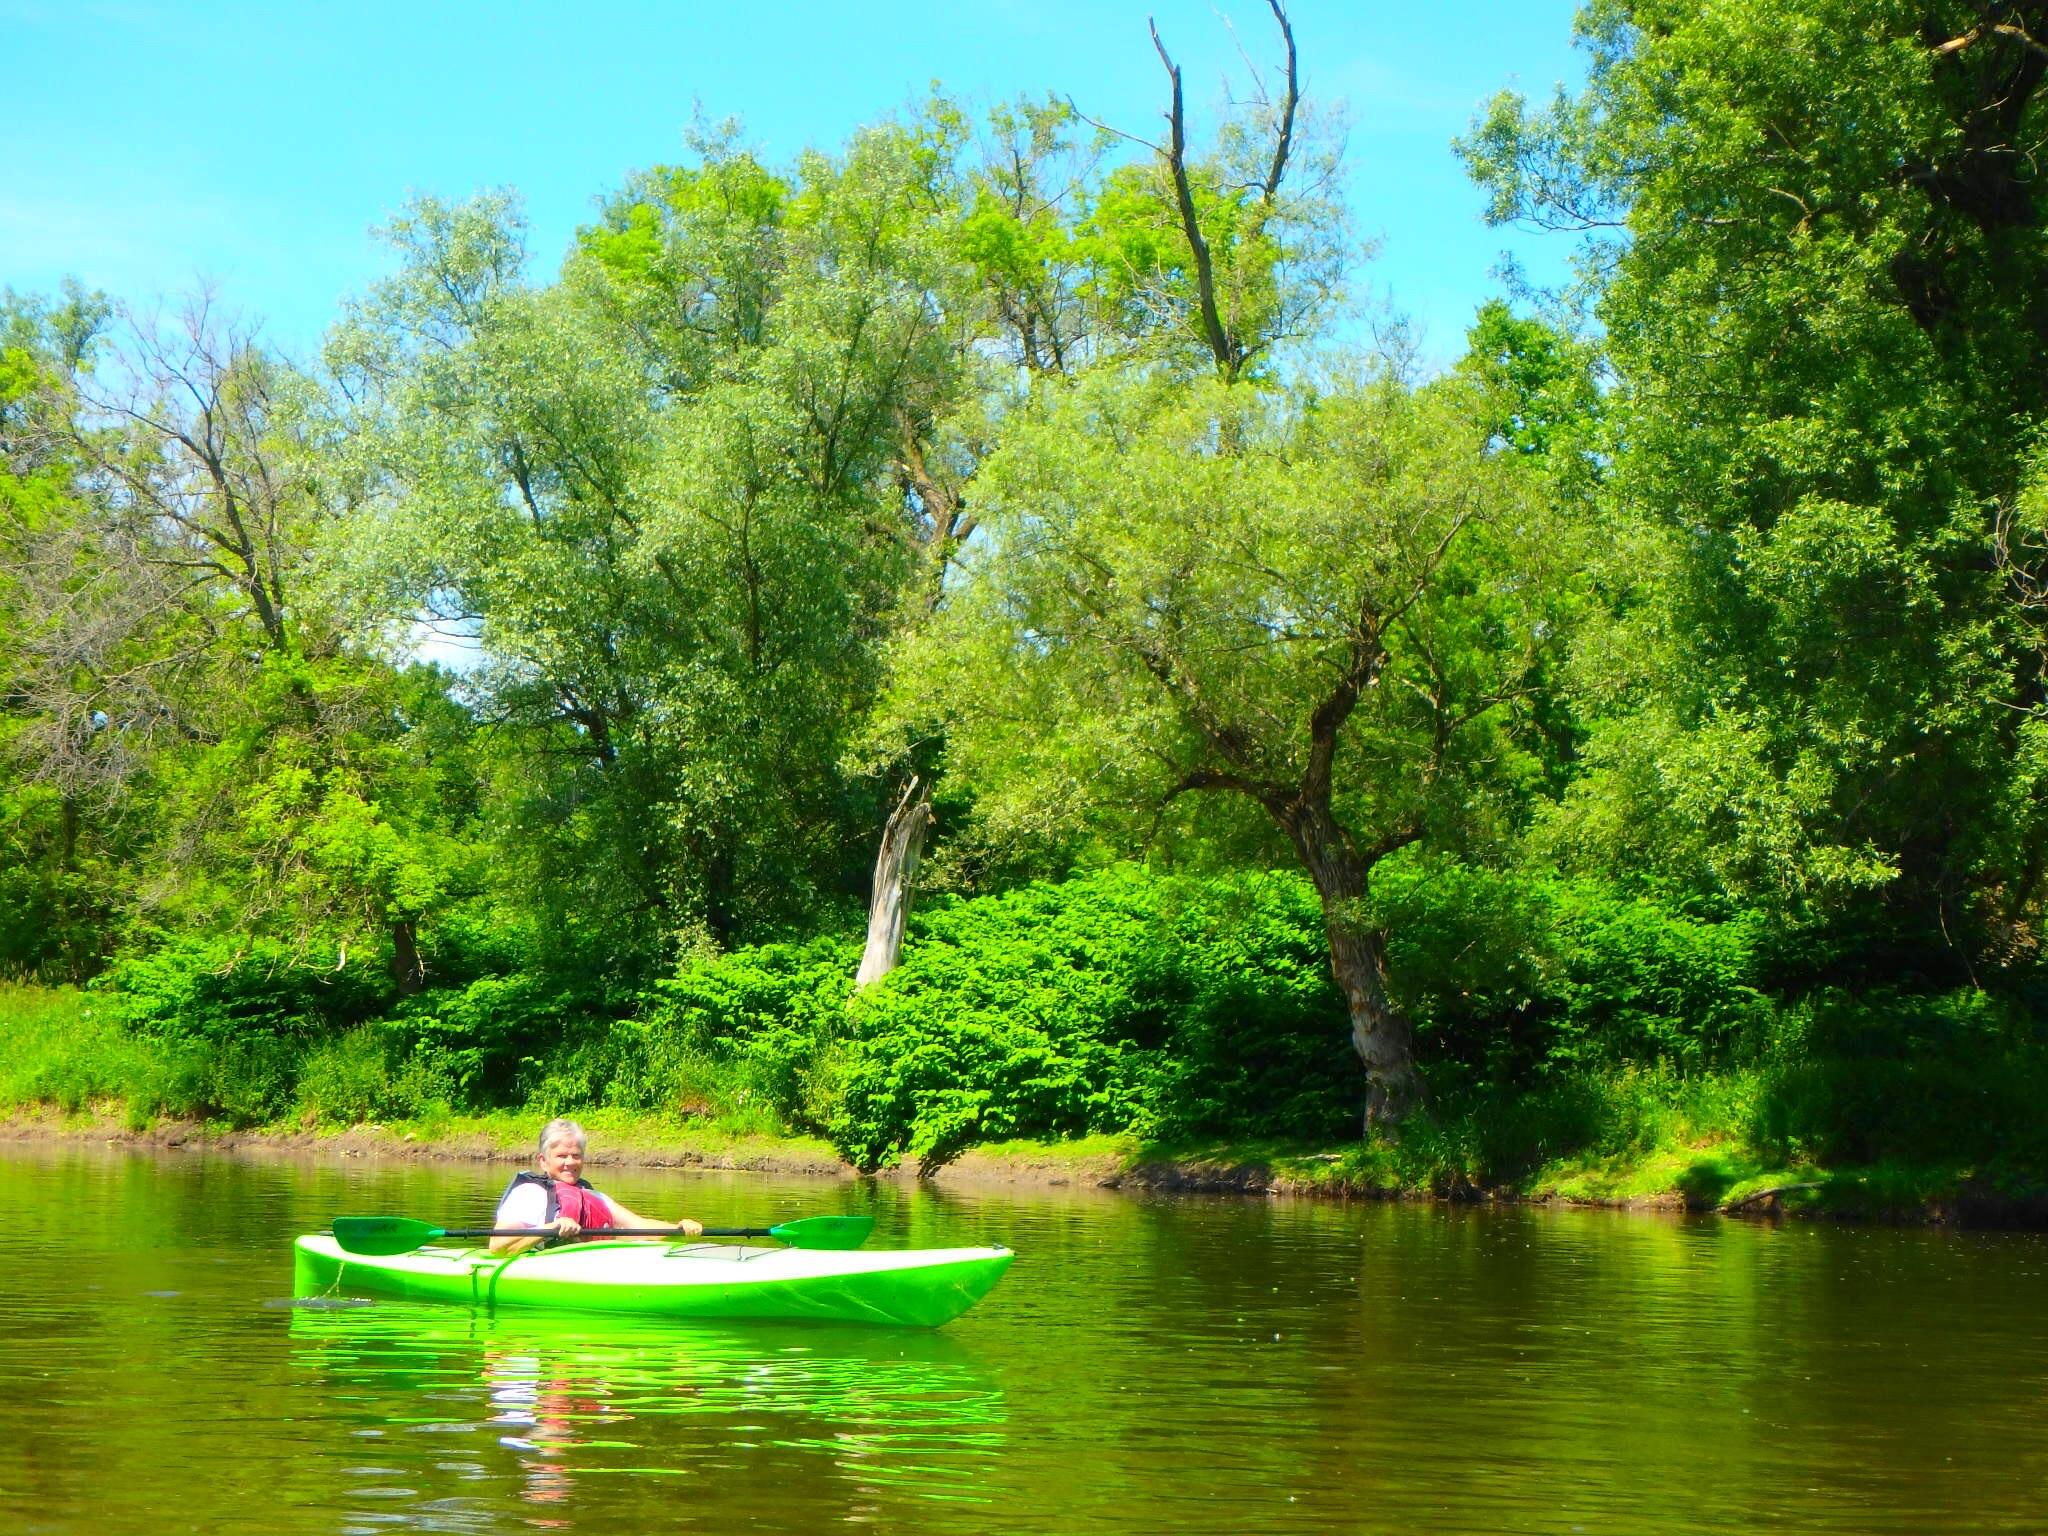 Kayaking Yoga Meditation - Solstice - Jun 21 2018-73